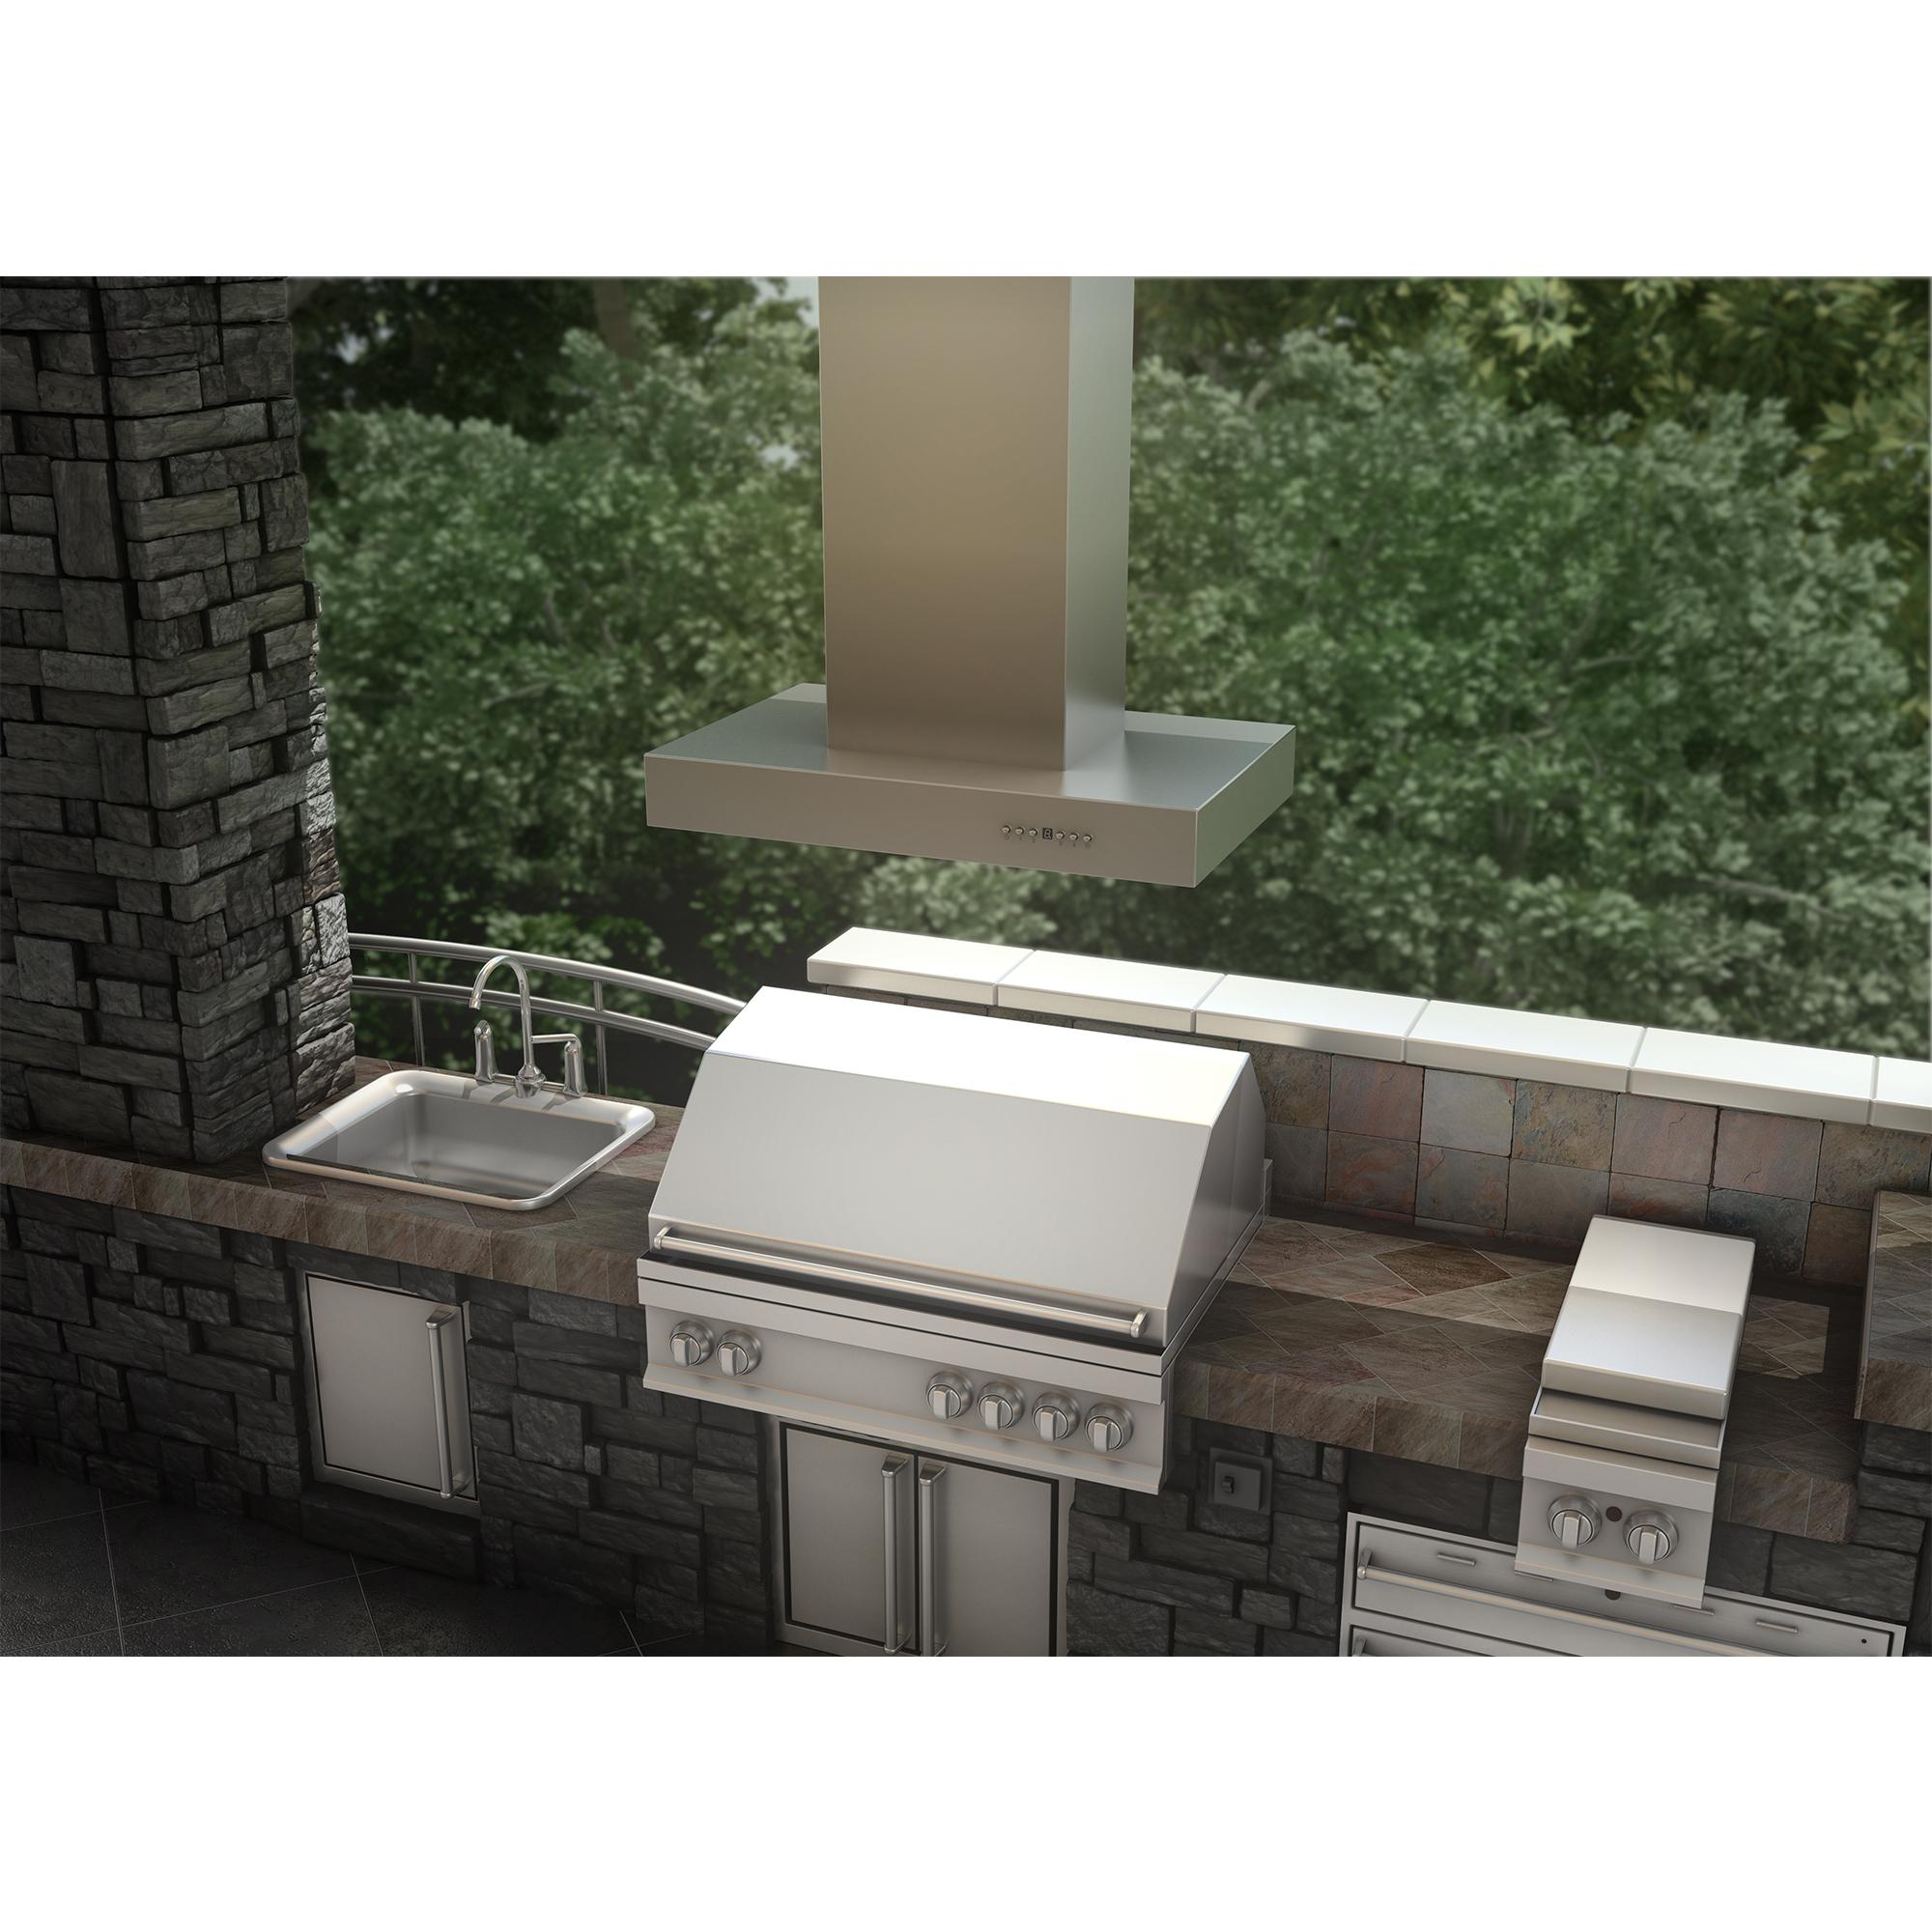 zline-stainless-steel-island-range-hood-KECOMi-kitchen-outdoor-2.jpg